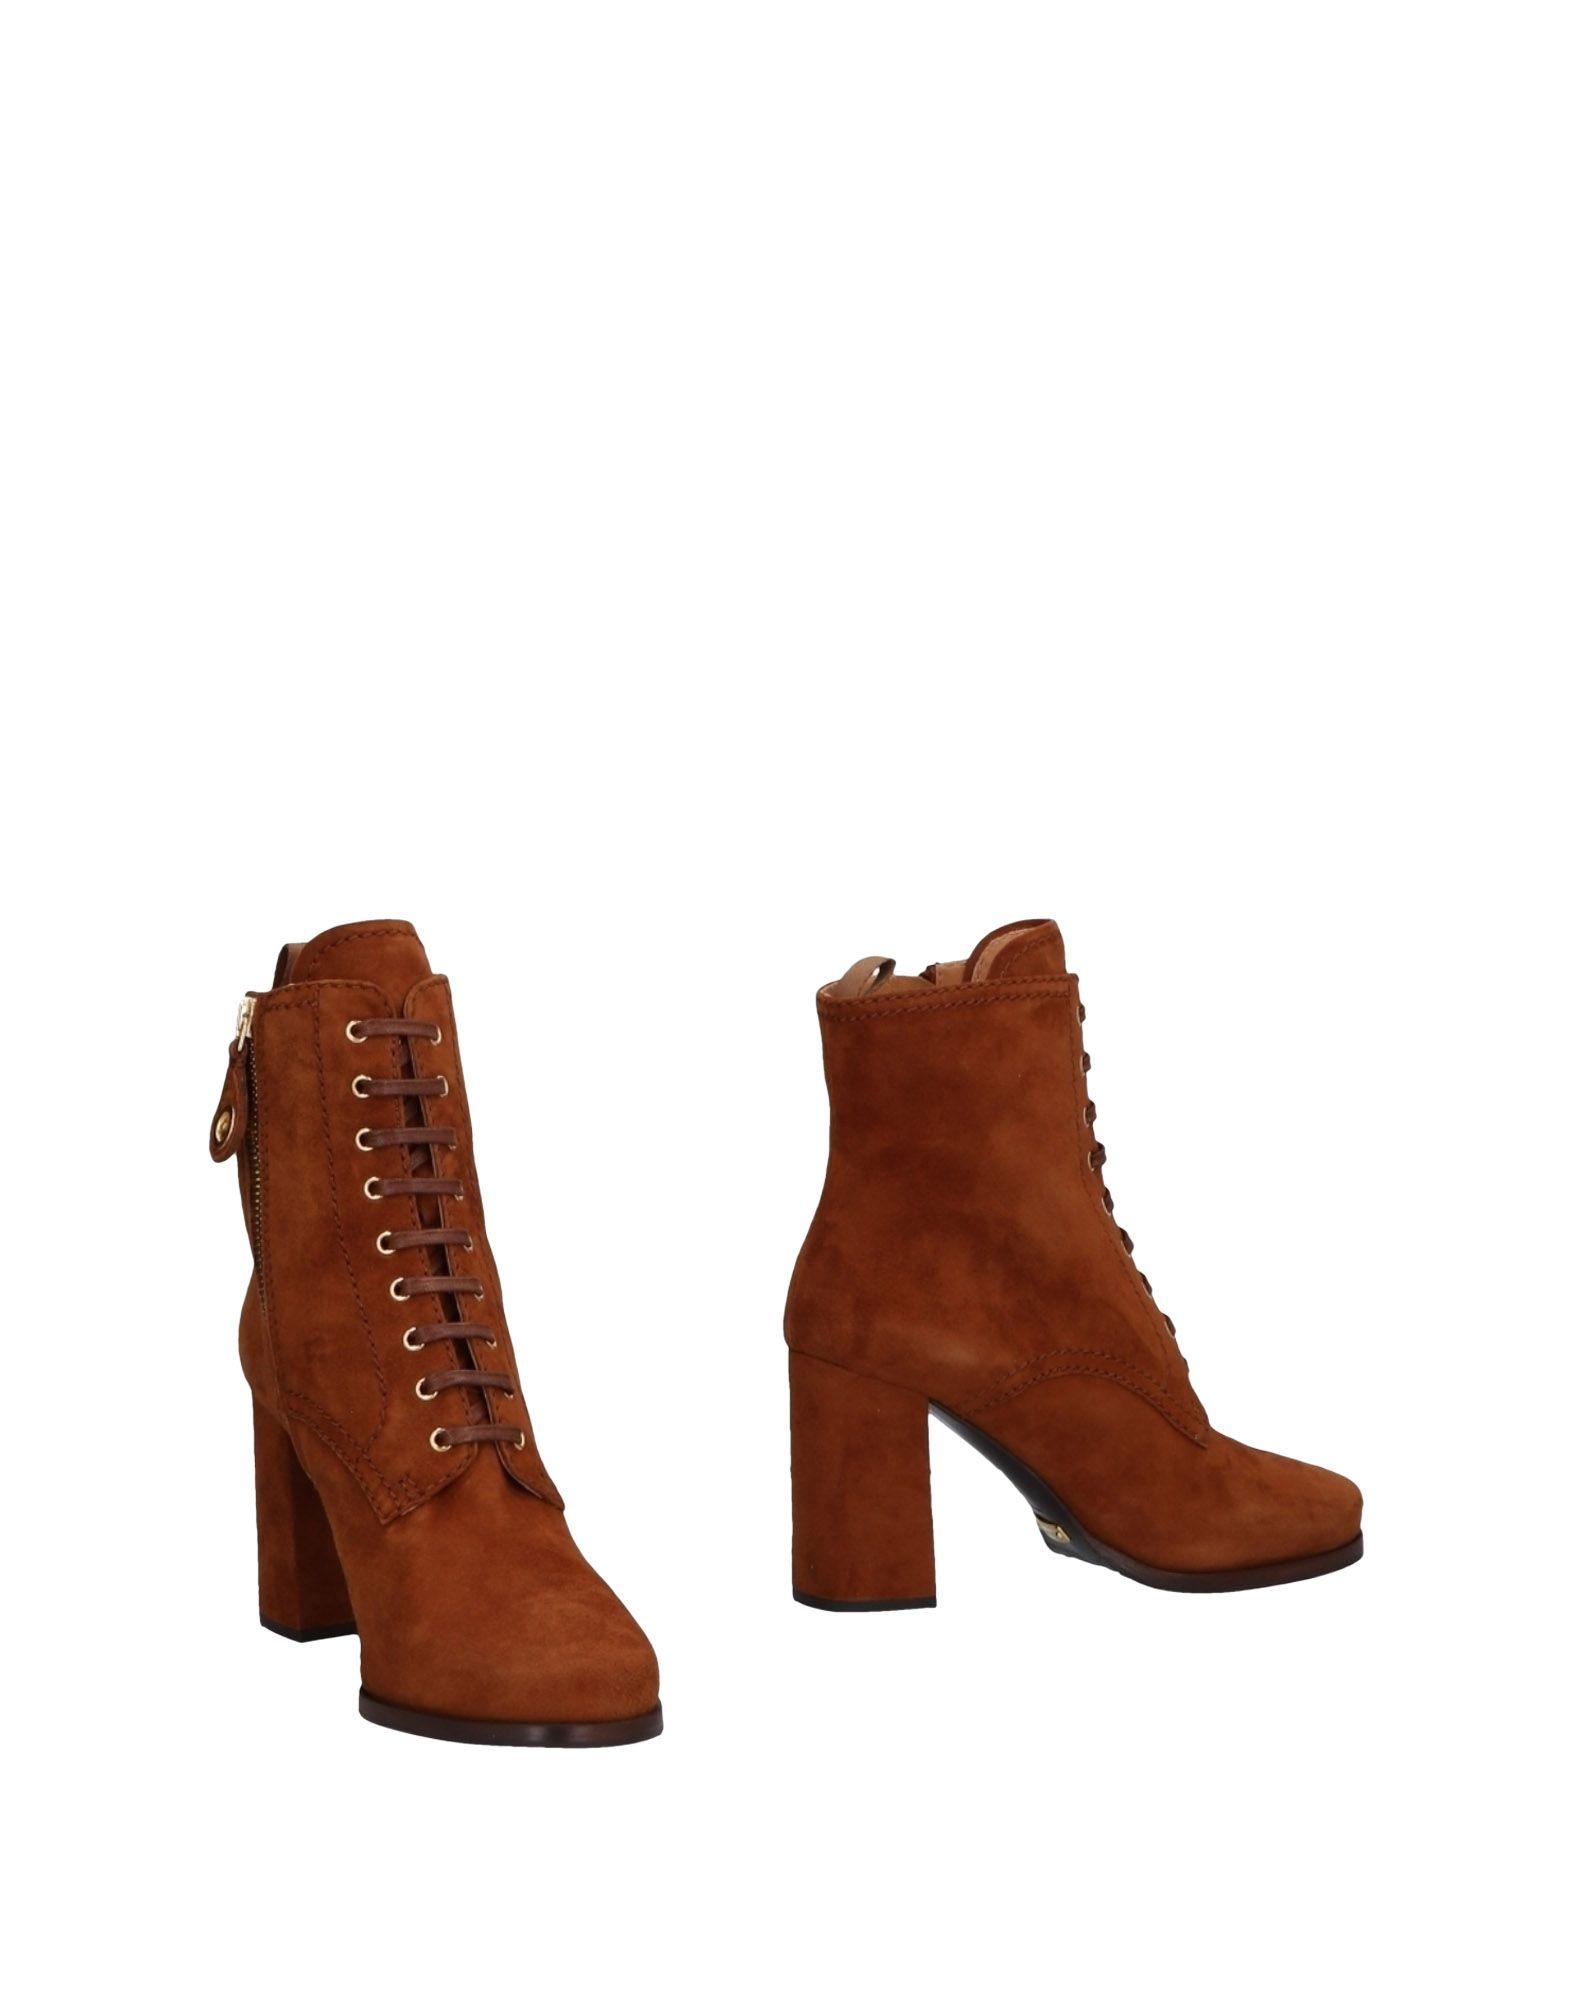 Moda Stivaletti Carshoe Donna - 11476582NT 11476582NT - 6efe33